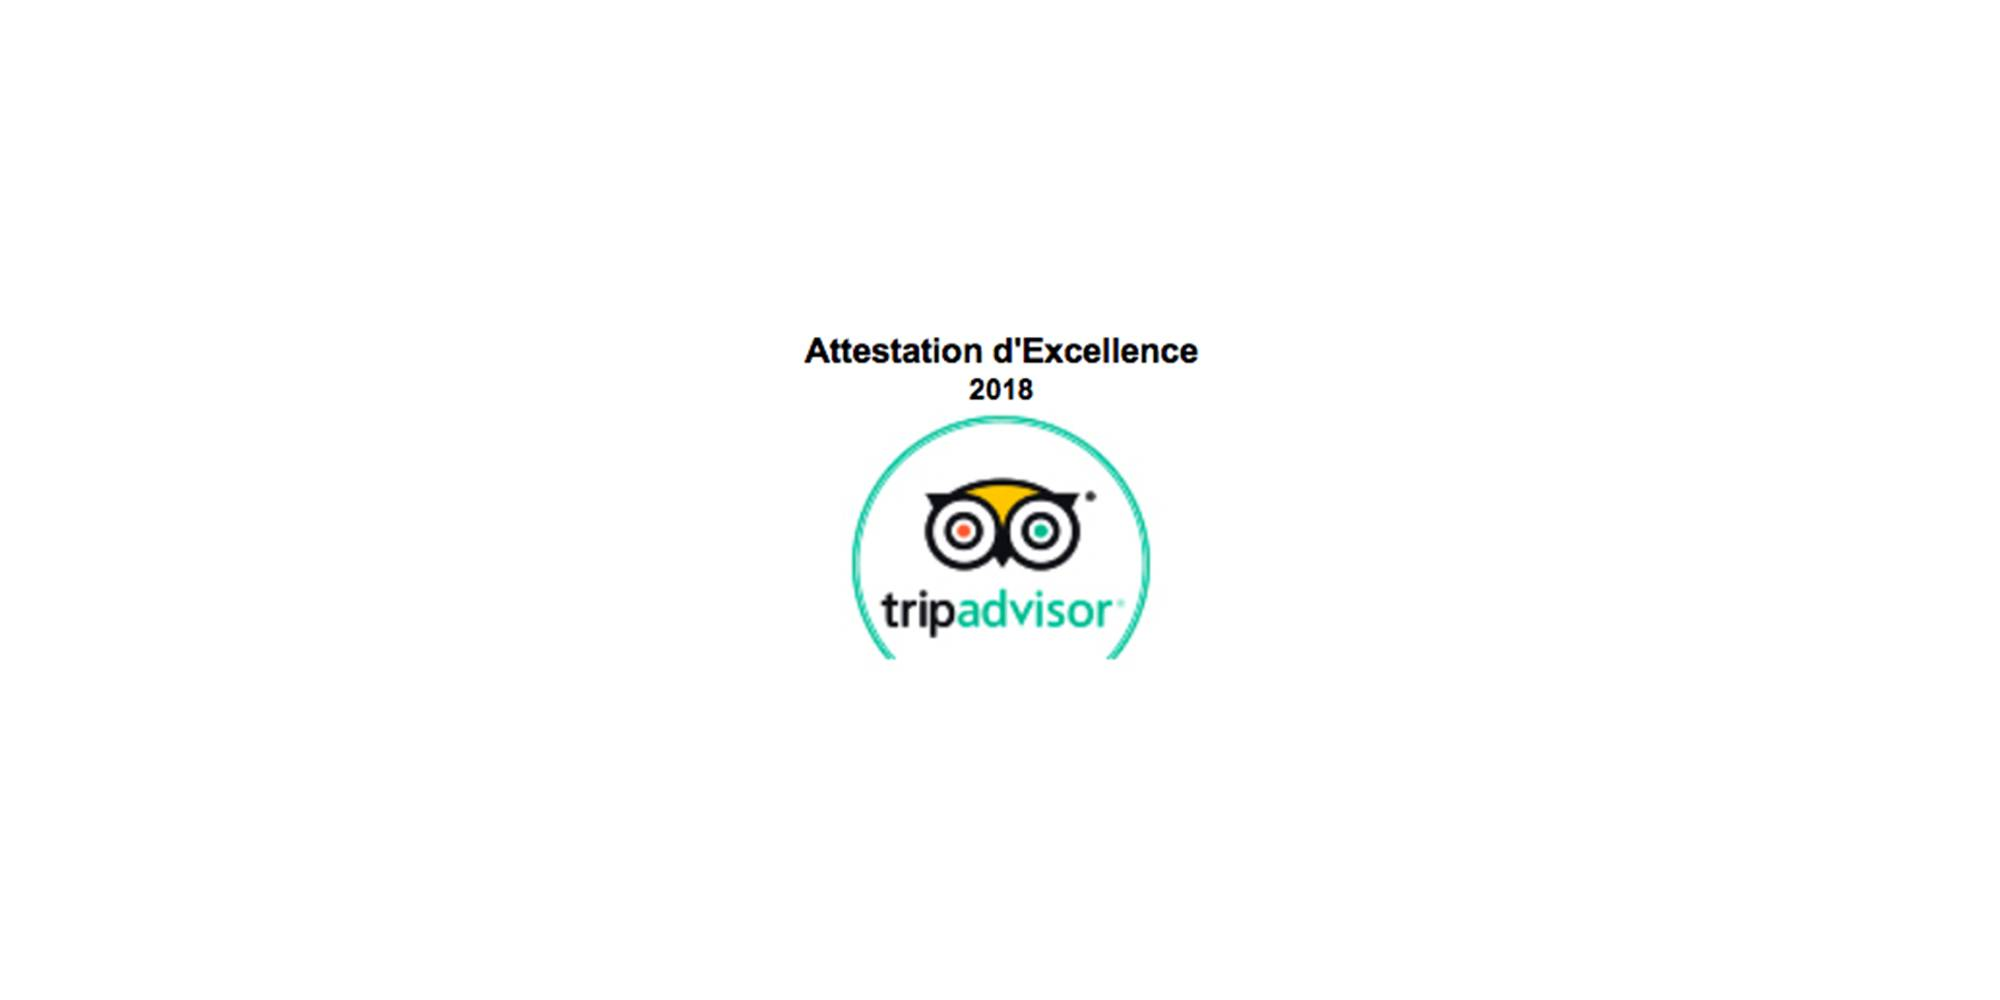 certificat d'excellence tripadvisor 2018 onlykart